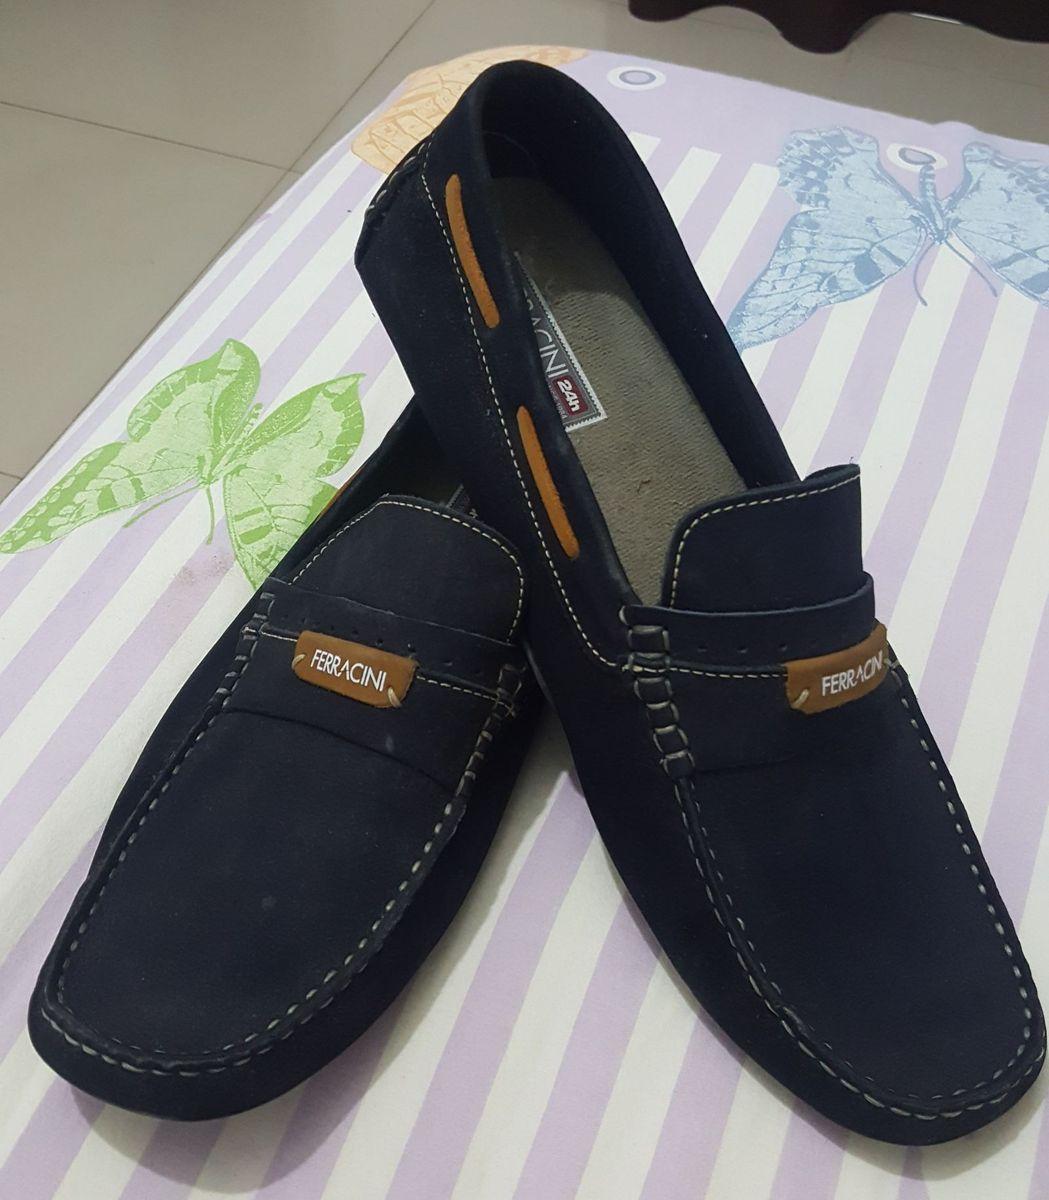 b7dc76467 mocassim ferracini - sapatos ferracini.  Czm6ly9wag90b3muzw5qb2vplmnvbs5ici9wcm9kdwn0cy82mzq5ndaylzg3yte1nti5nzrhzgm5mzeyotg1ytrjngixmmu3ytu5lmpwzw